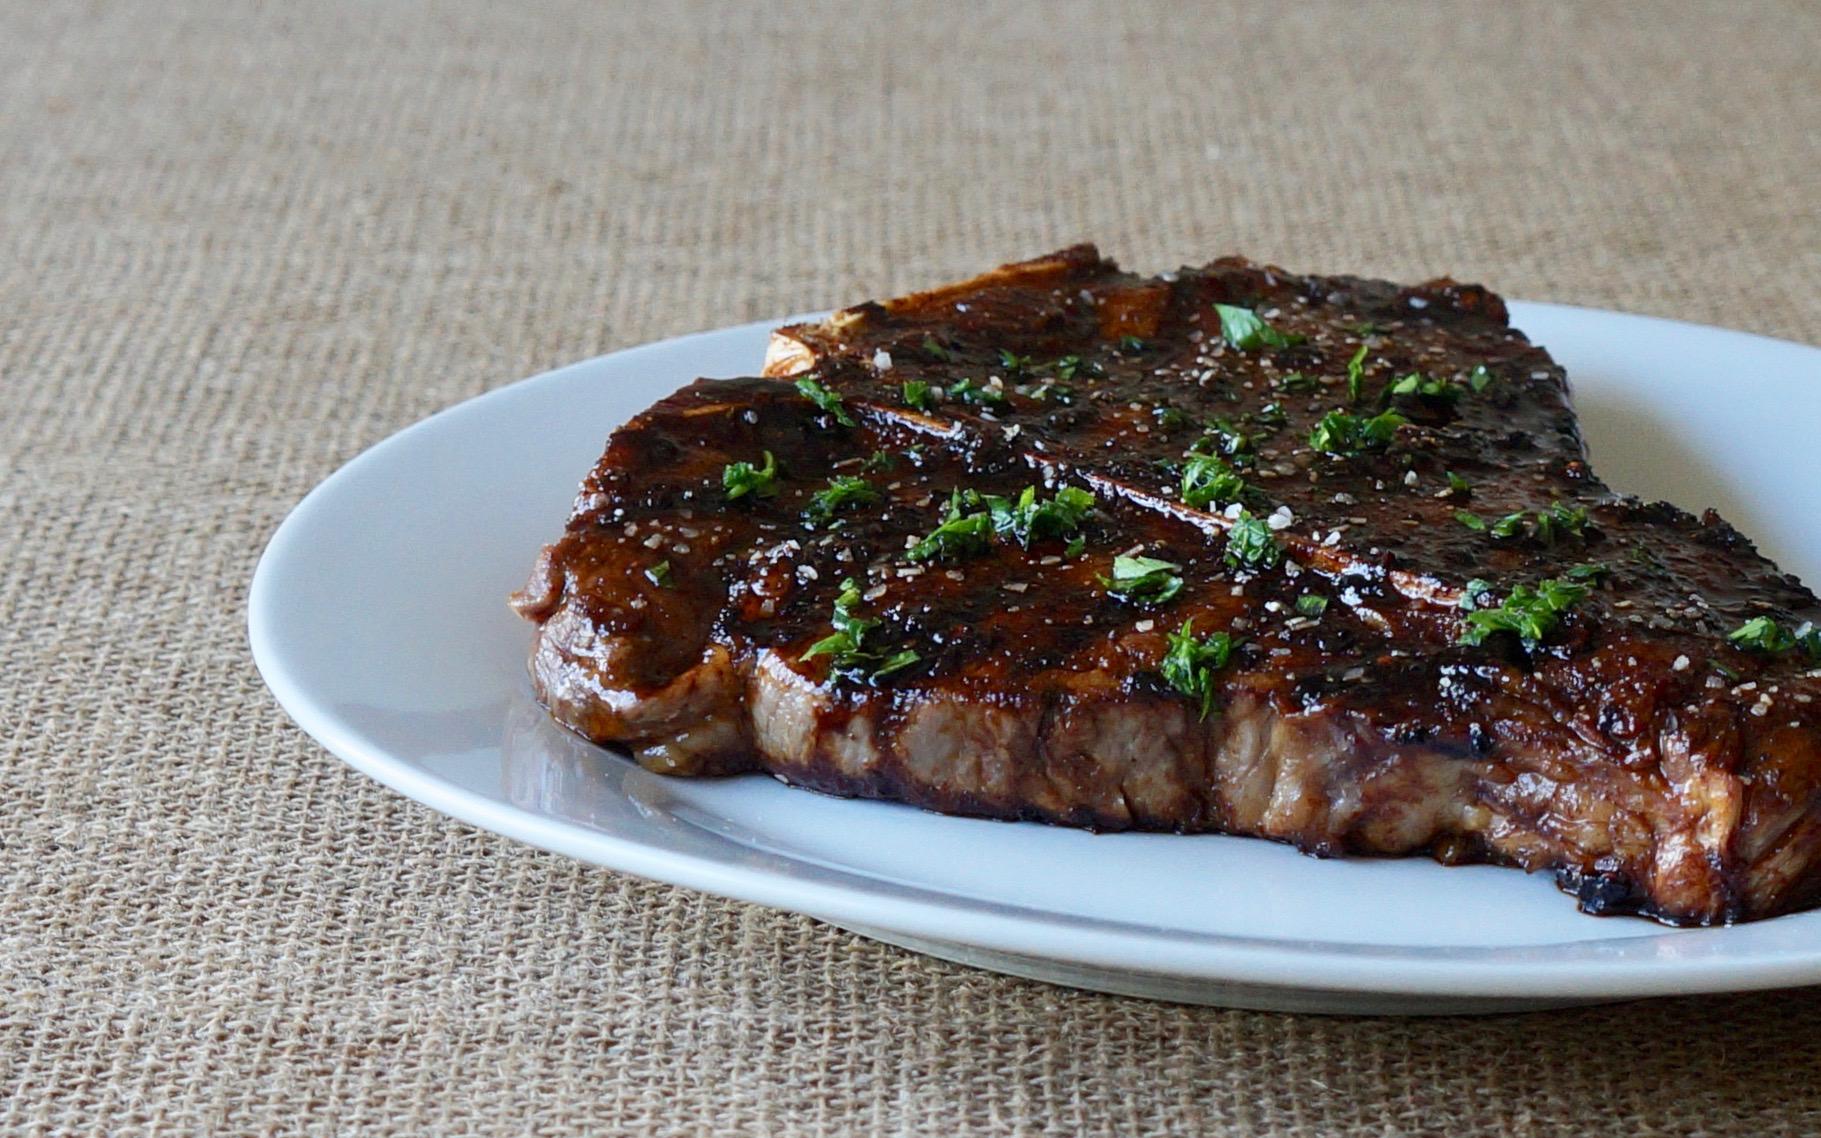 T-Bone-Steak-Rebecca-Gordon-Publisher-Buttermilk-Lipstick-Culinary-Entertaining-Techniques-Southern-Hostess-RebeccaGordon-Pastry-Chef-Birmingham-Alabama-Tex-Mex-Steak